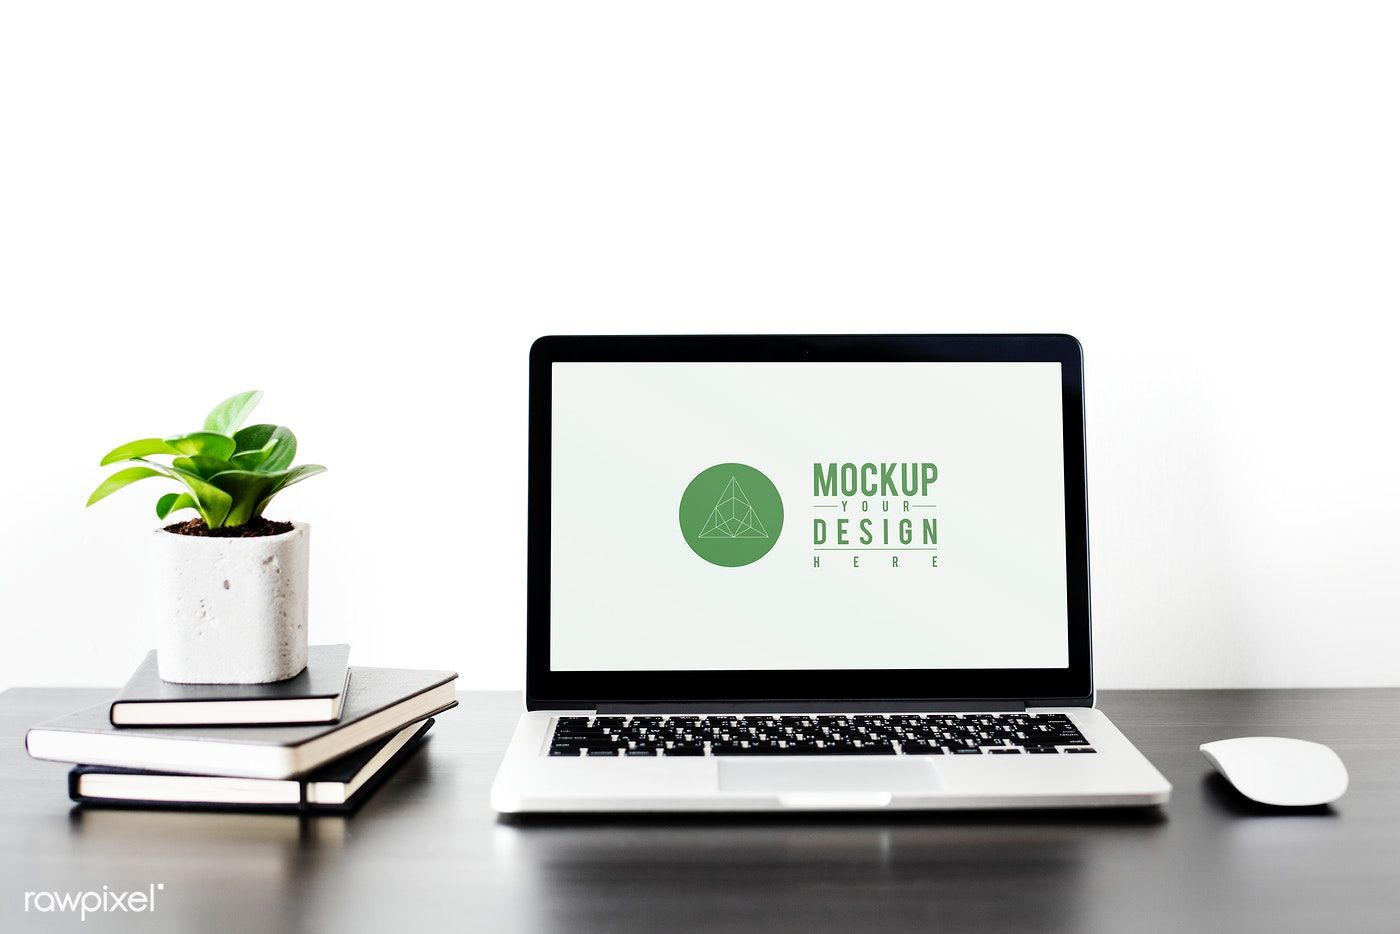 Download Premium Psd Of Laptop Digital Device Screen Mockup 527619 Computer Mockup Mockup Laptop